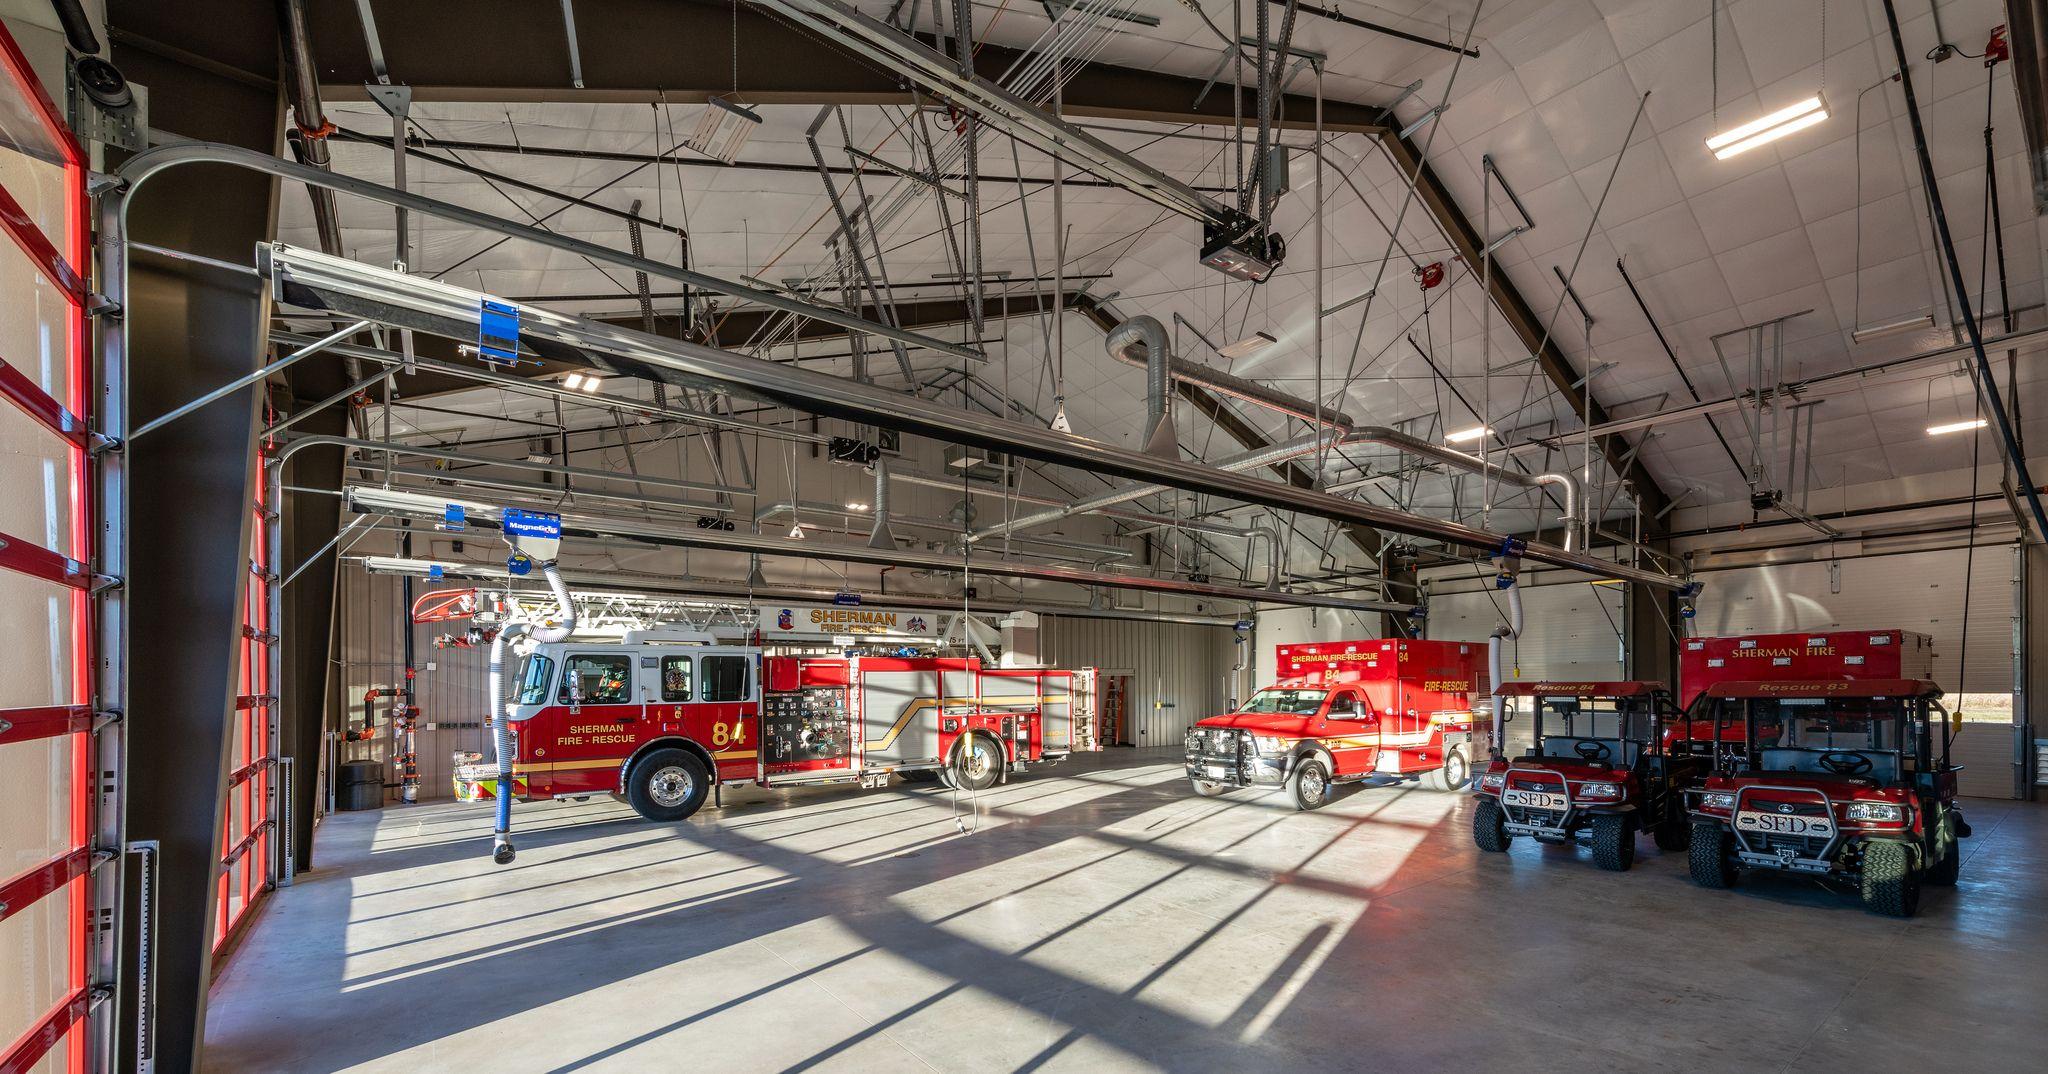 Sherman Fire Station